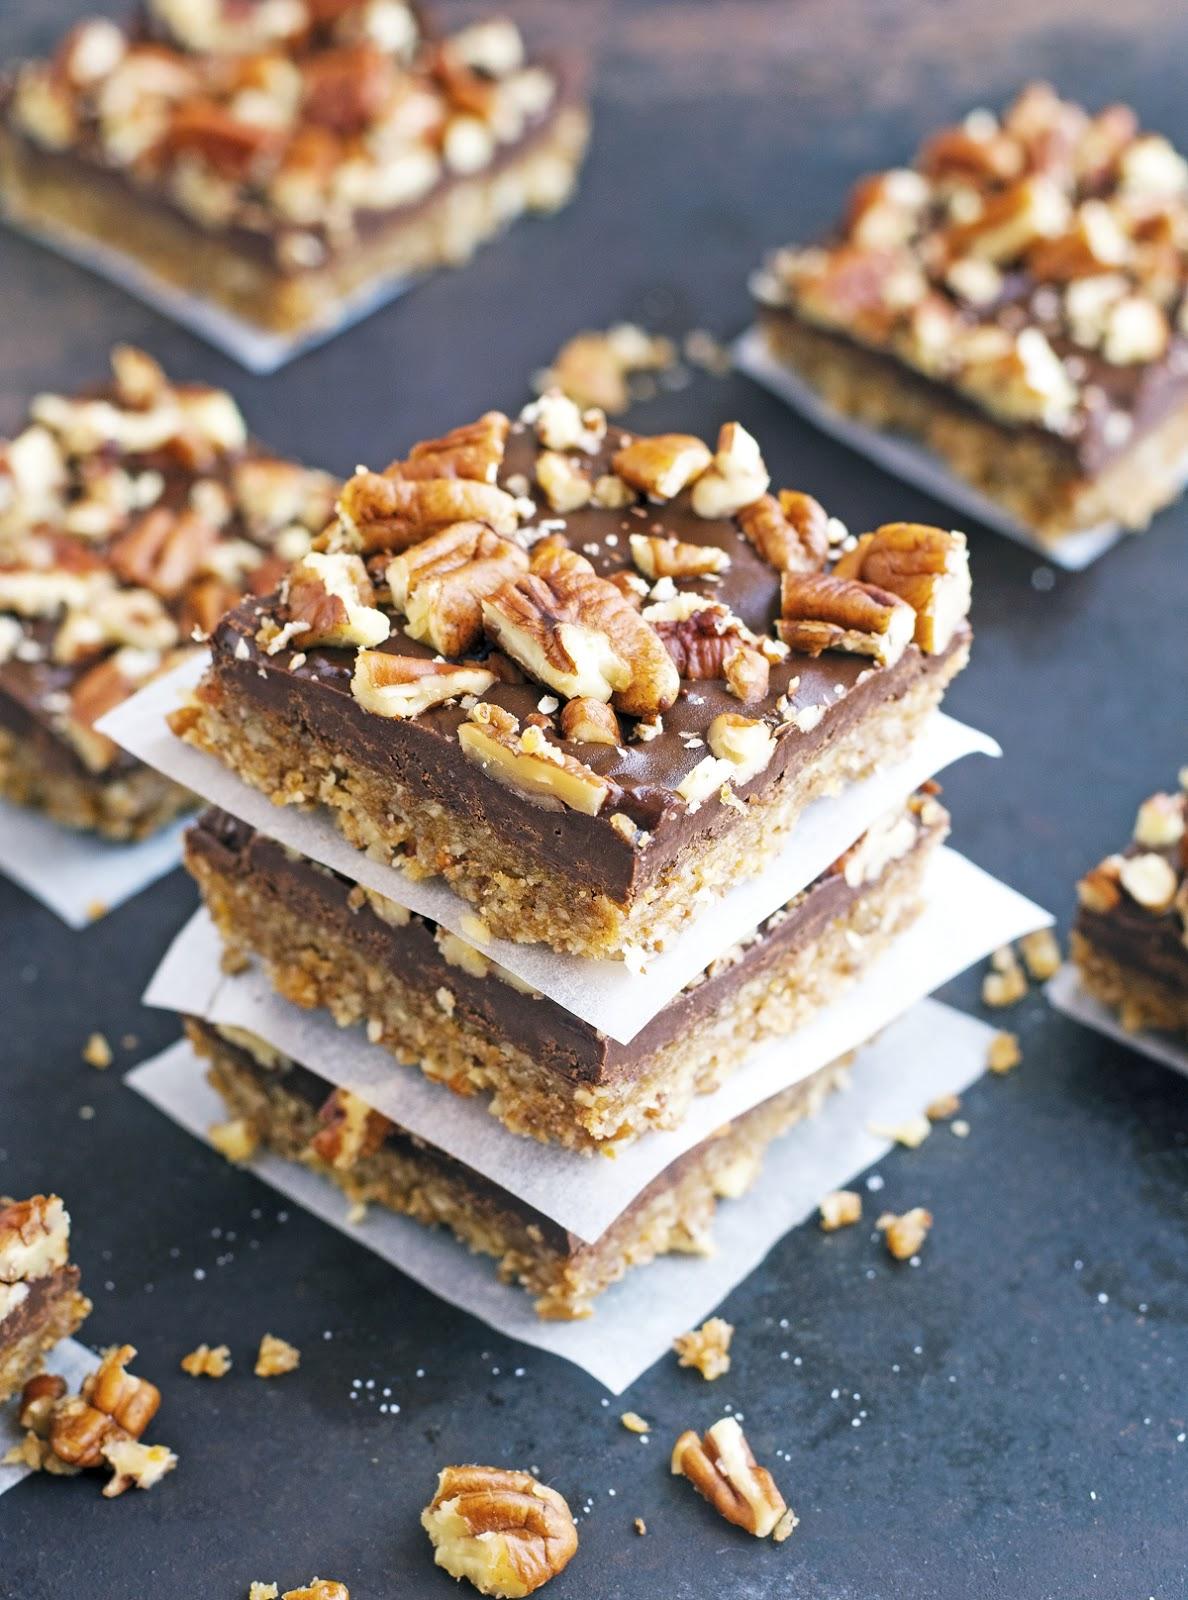 (Paleo & Vegan) Chocolate Pecan Bars